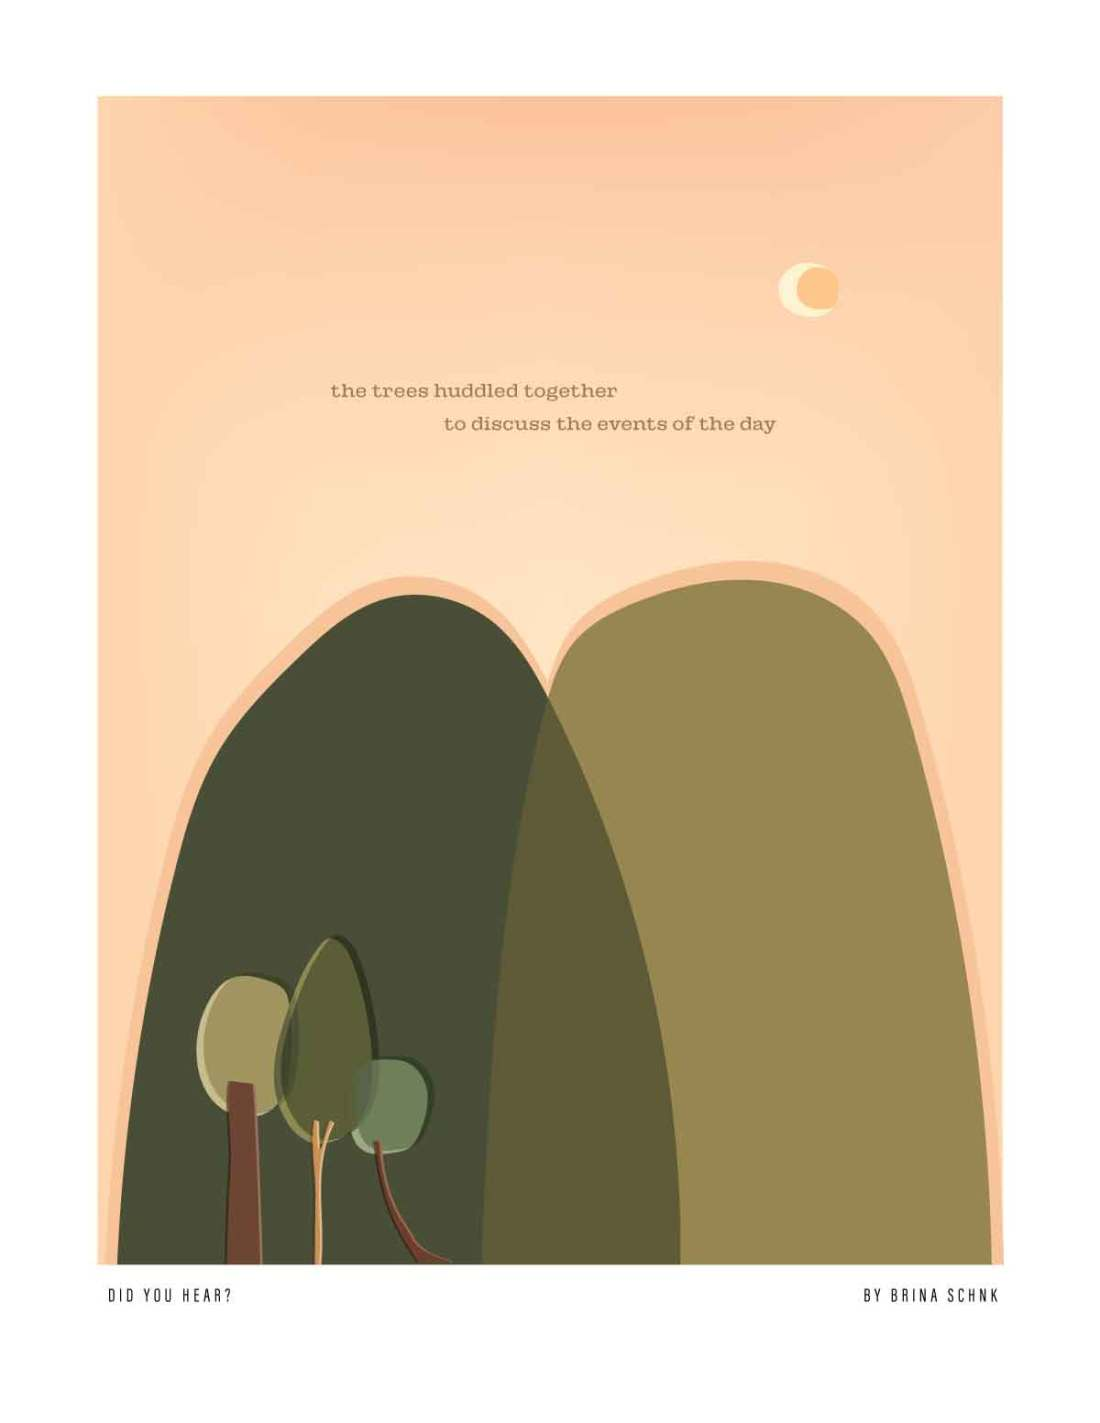 single page storytelling, illustrations by Brina Schenk